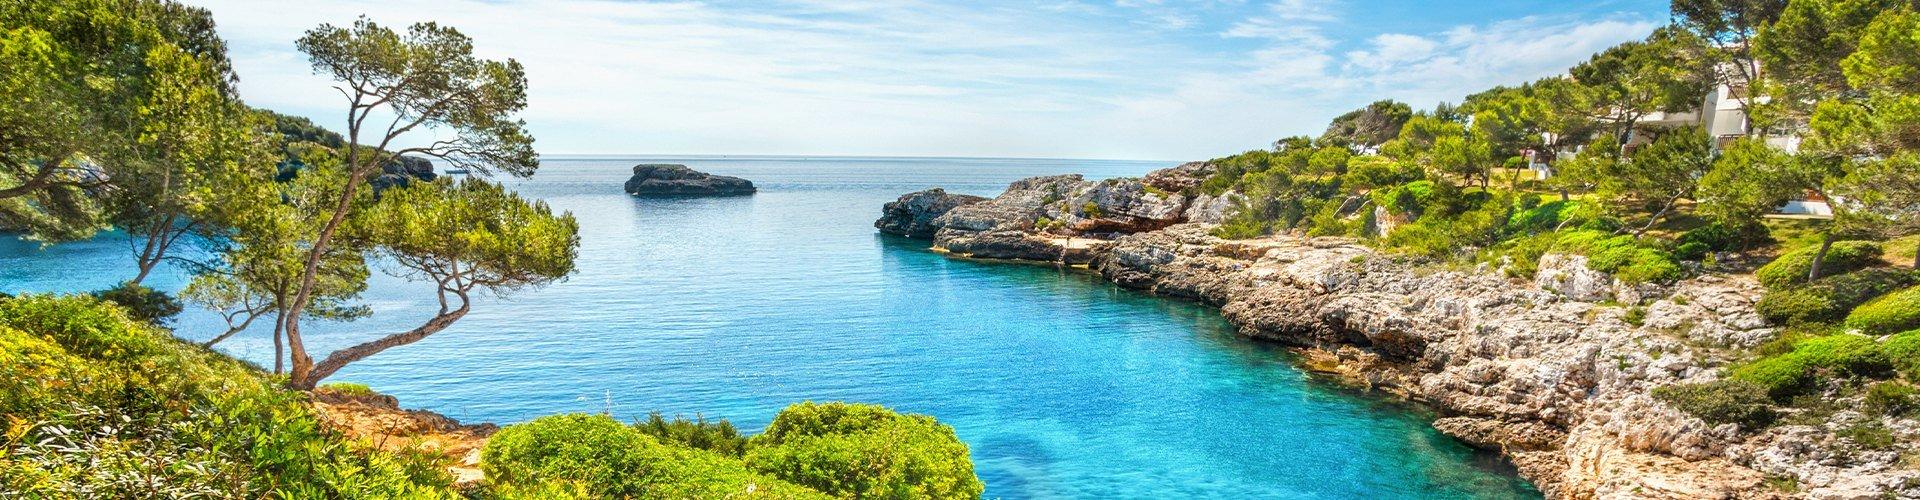 Insidertipps Mallorca